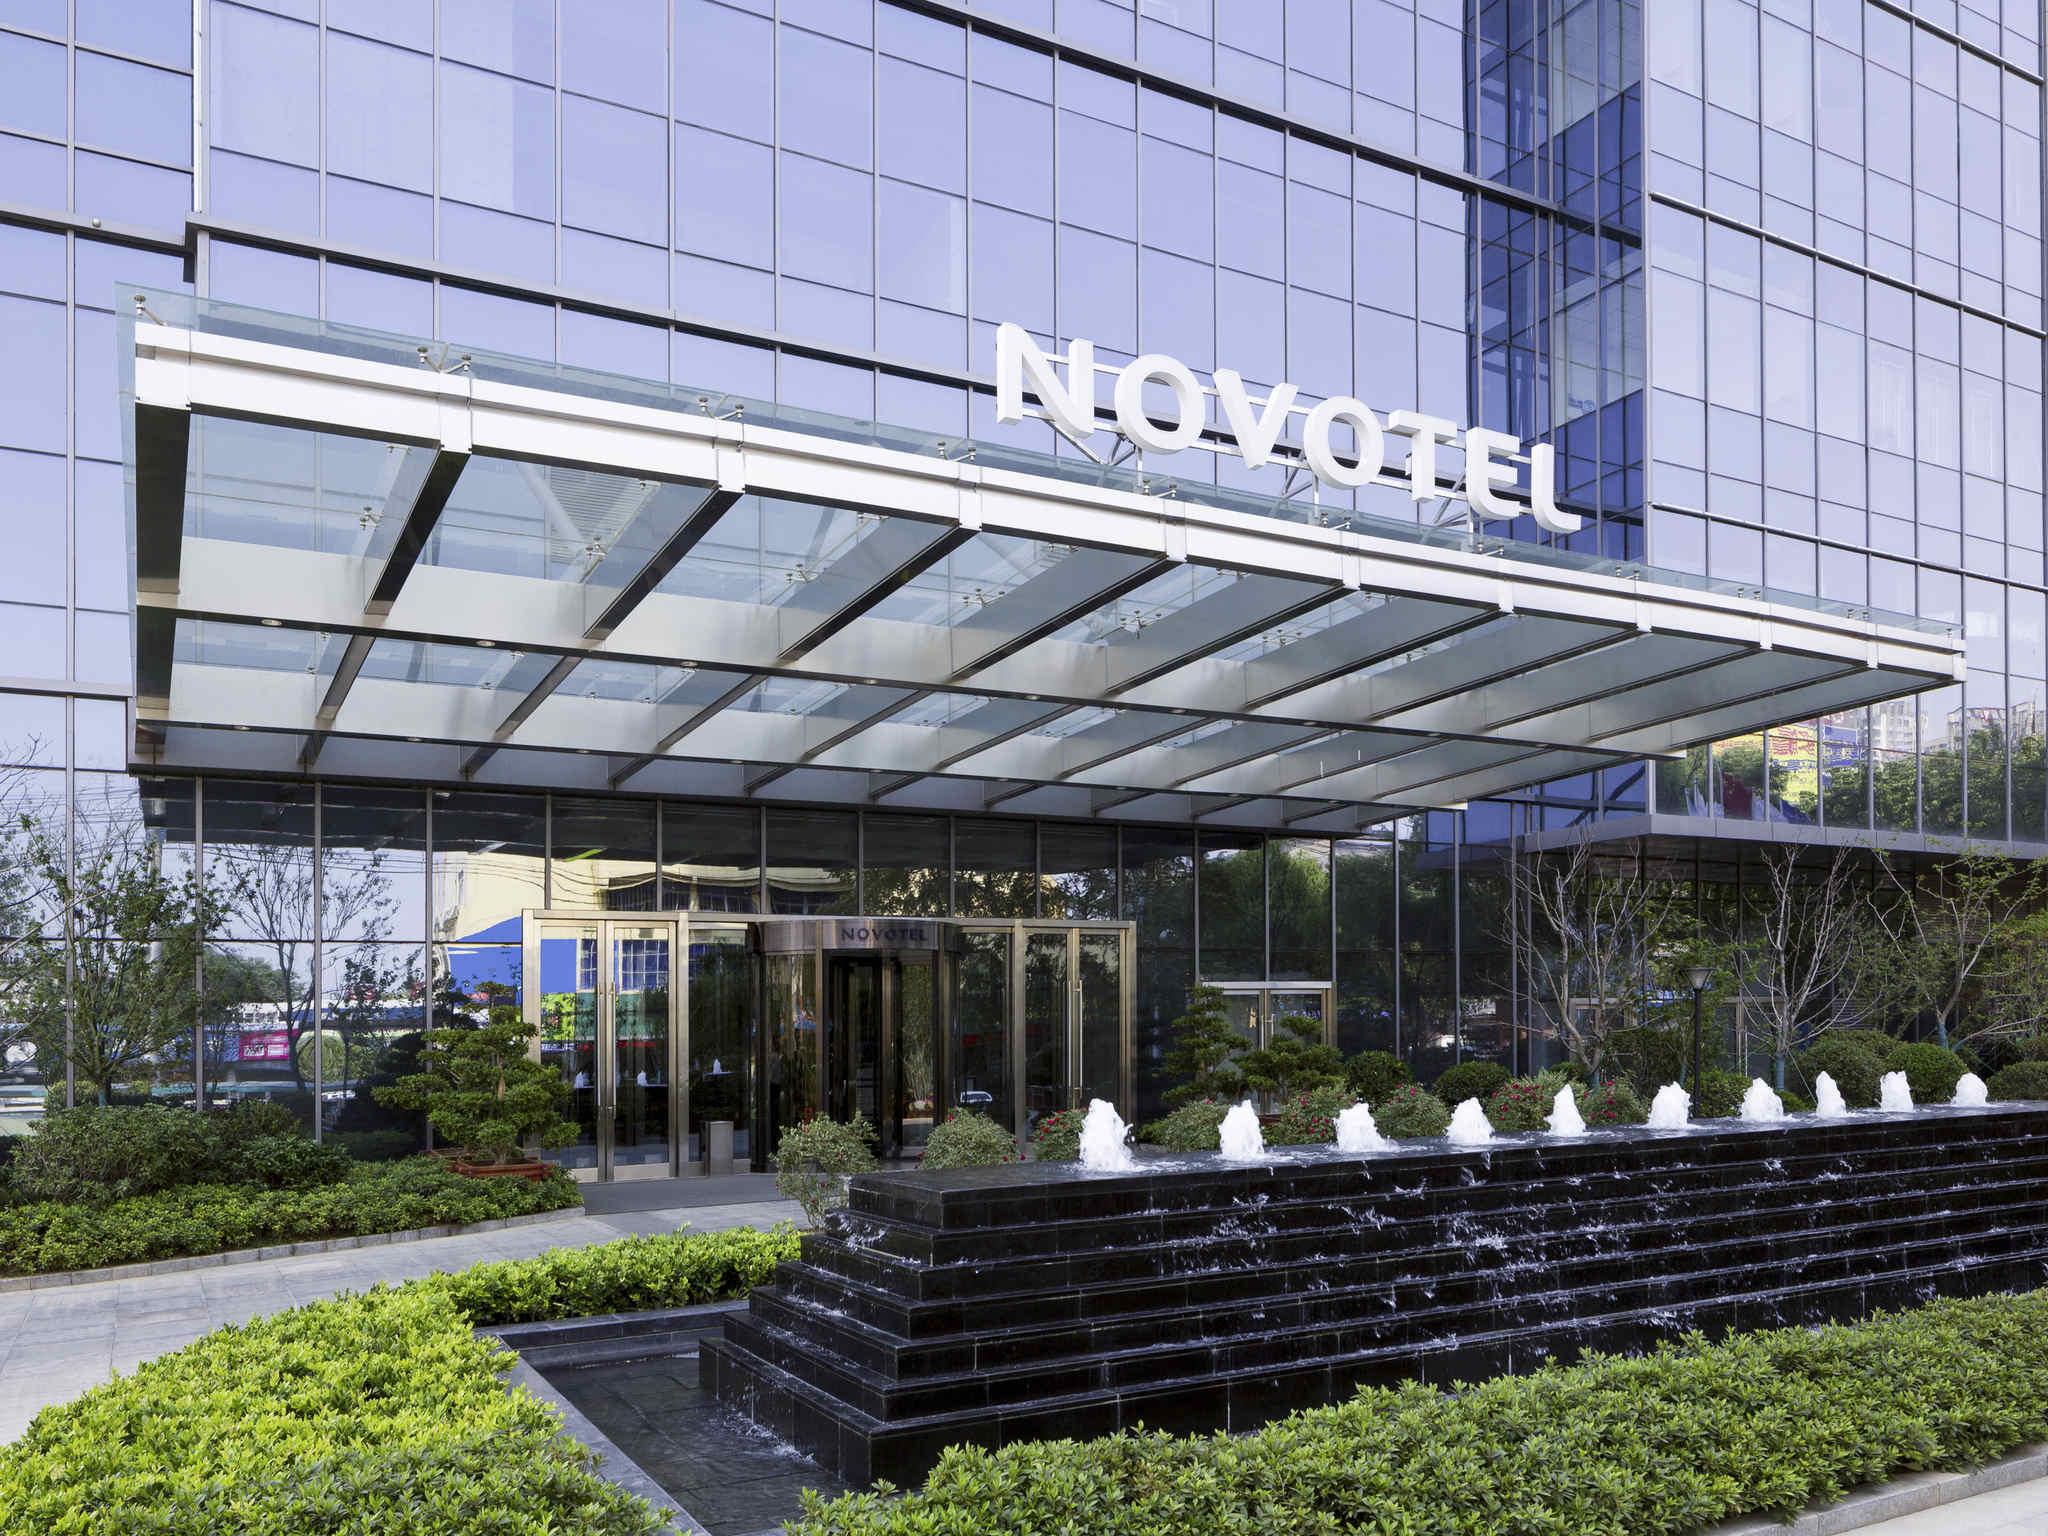 Hotel - Novotel Rizhao Suning